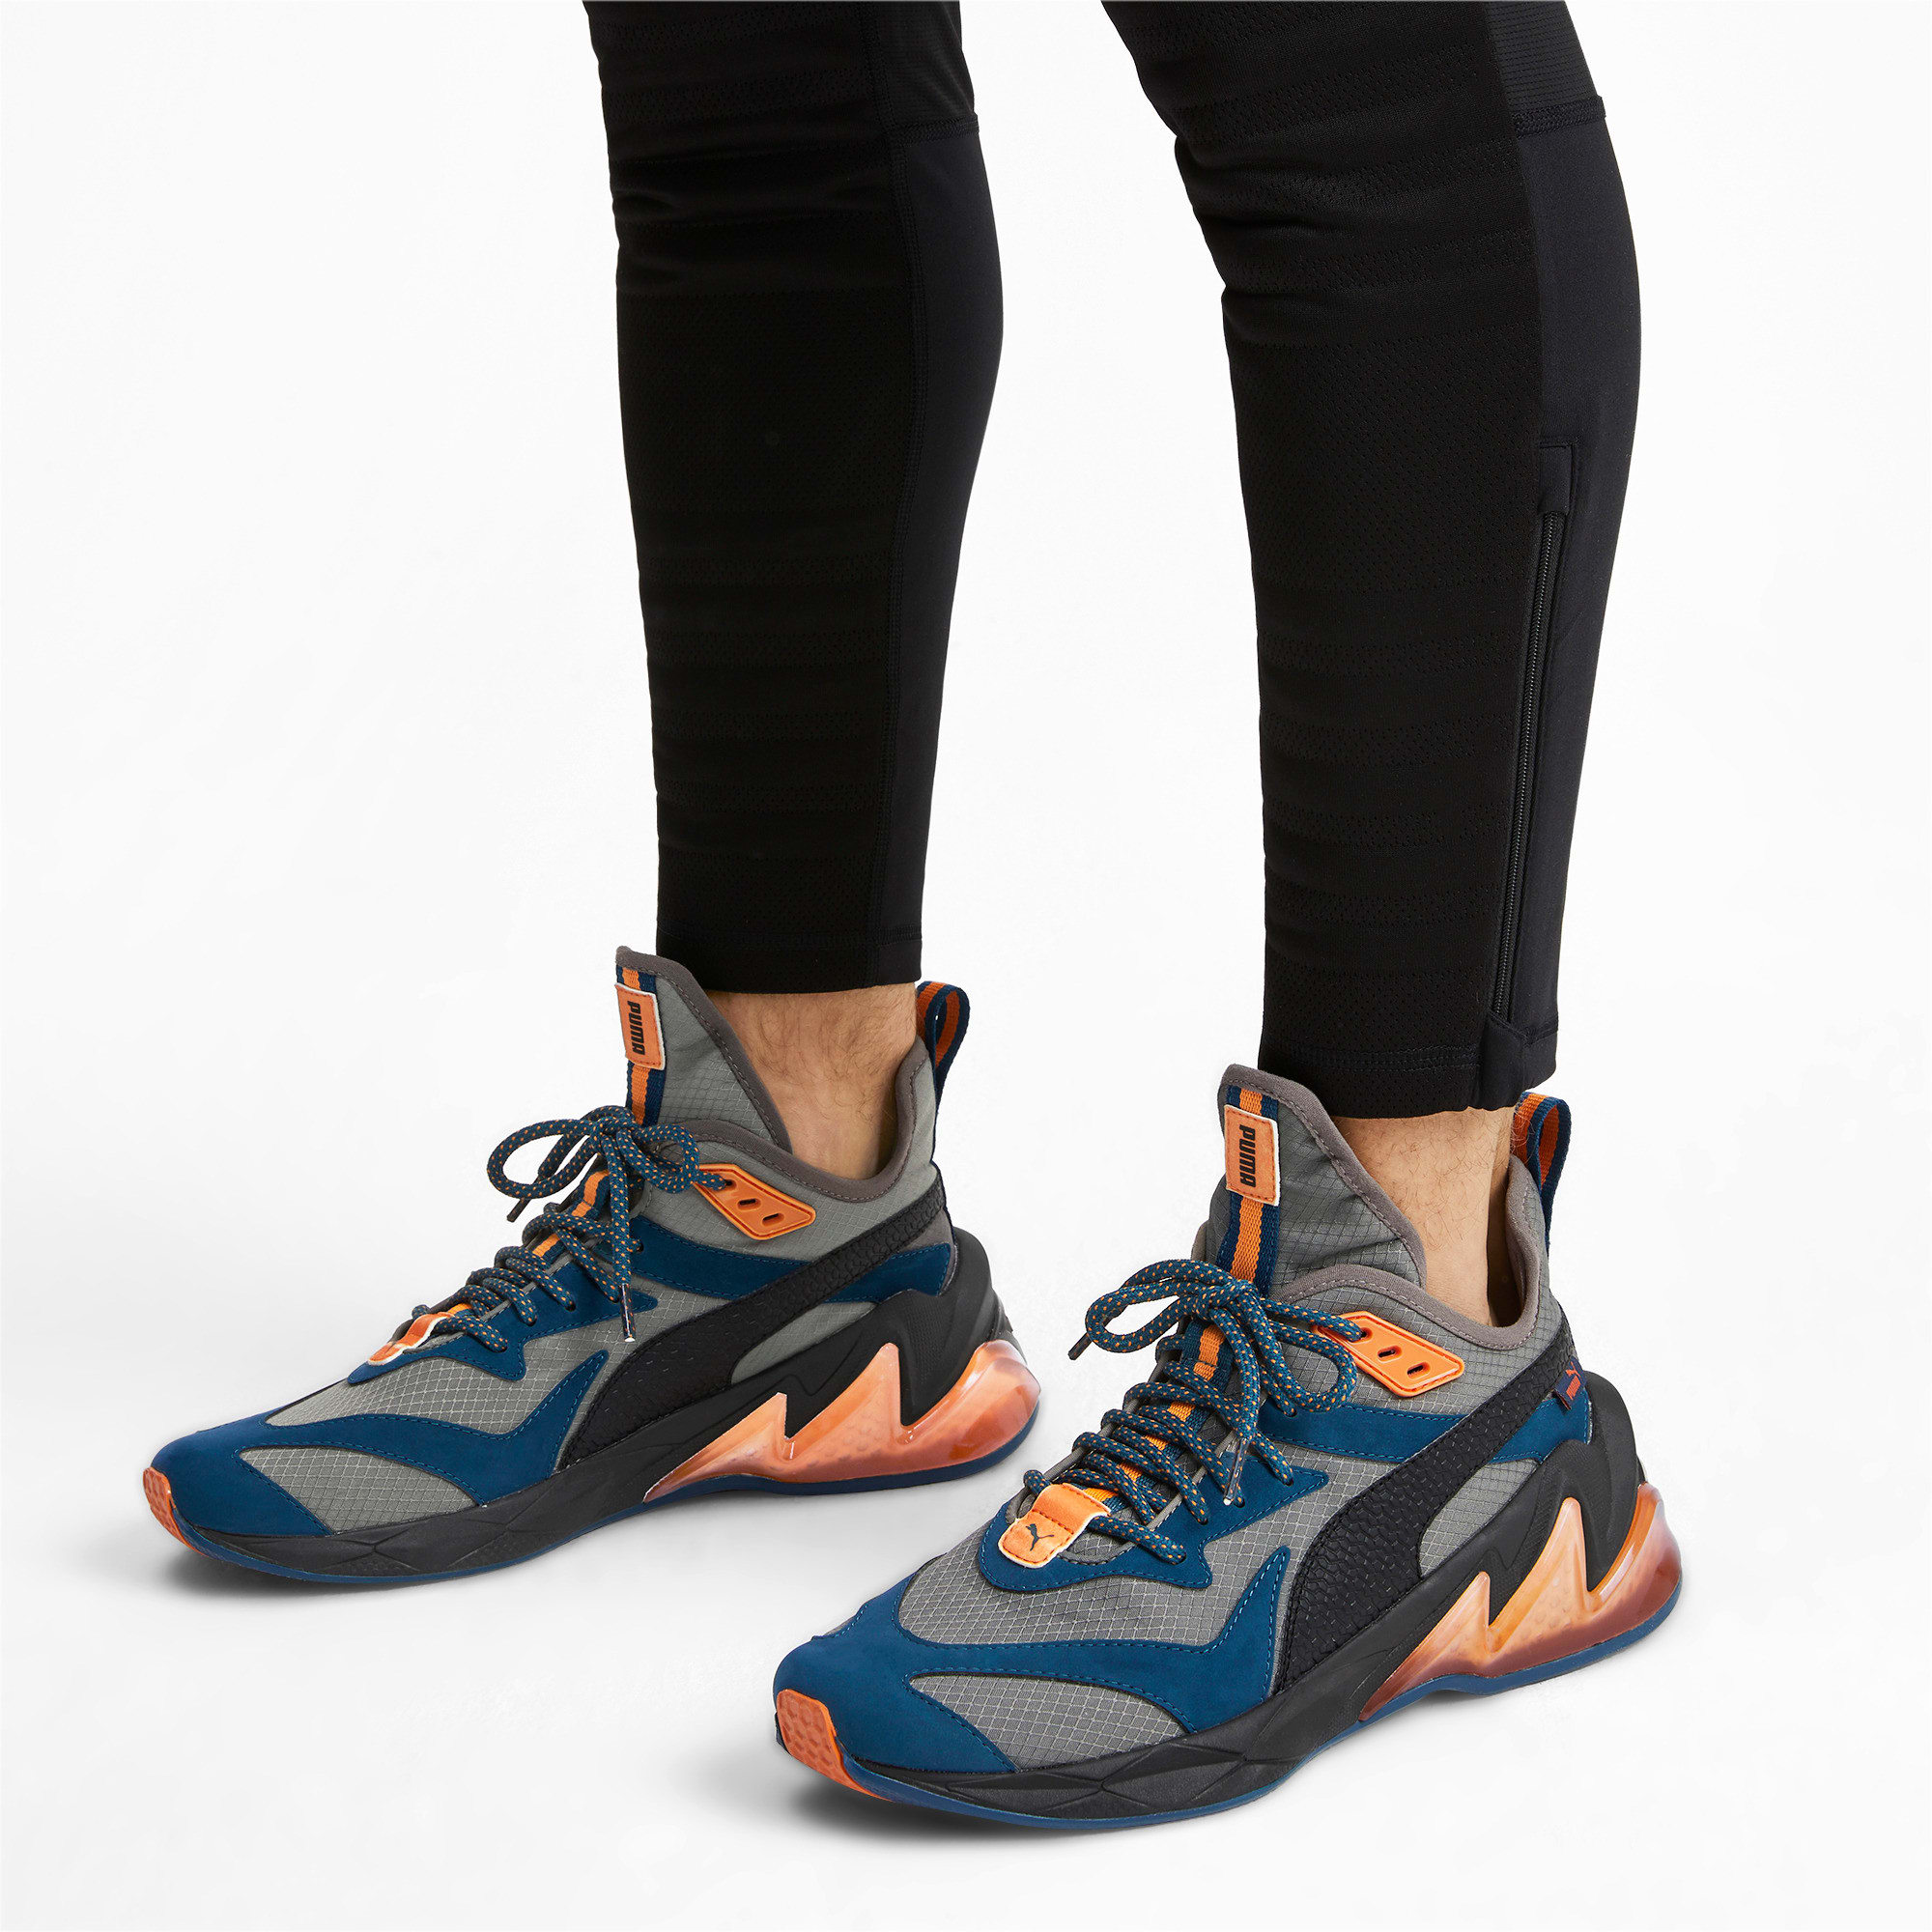 Thumbnail 2 of LQDCELL Origin Terrain Men's Shoes, CASTLEROCK-Puma Black, medium